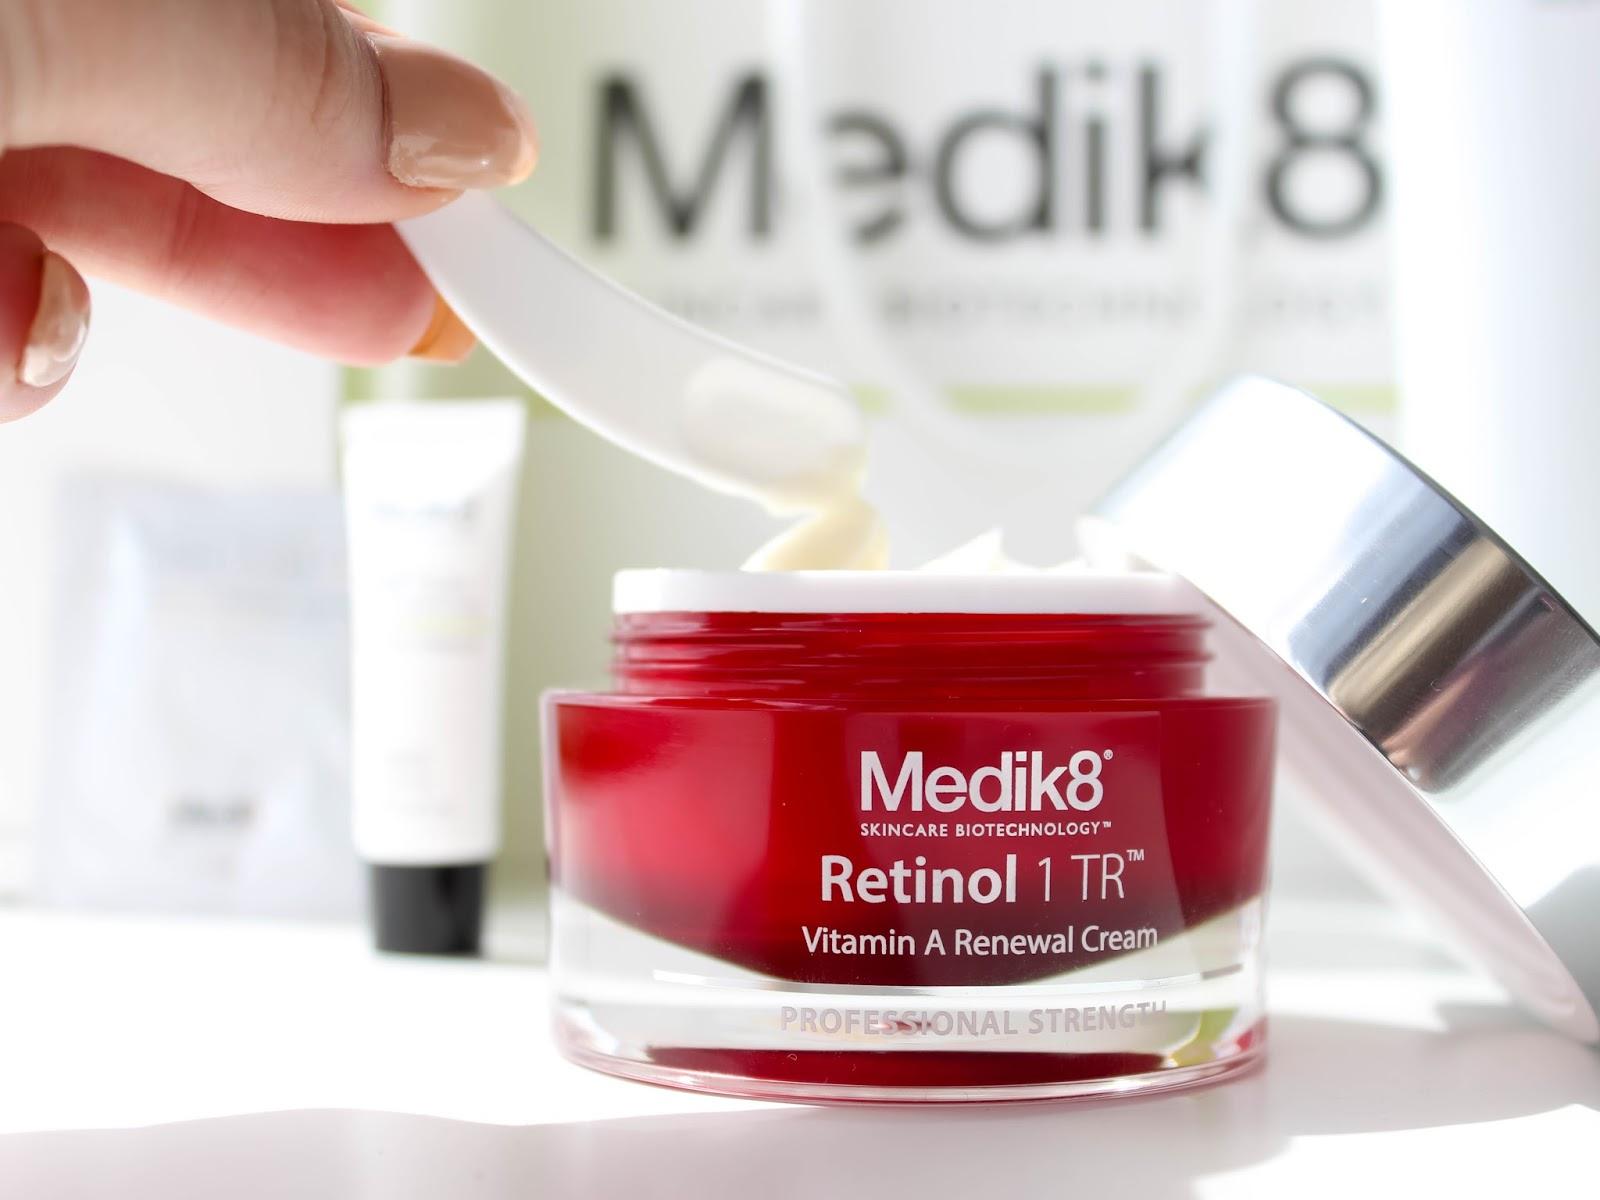 medic8 retinol1 tr noční krém recenze